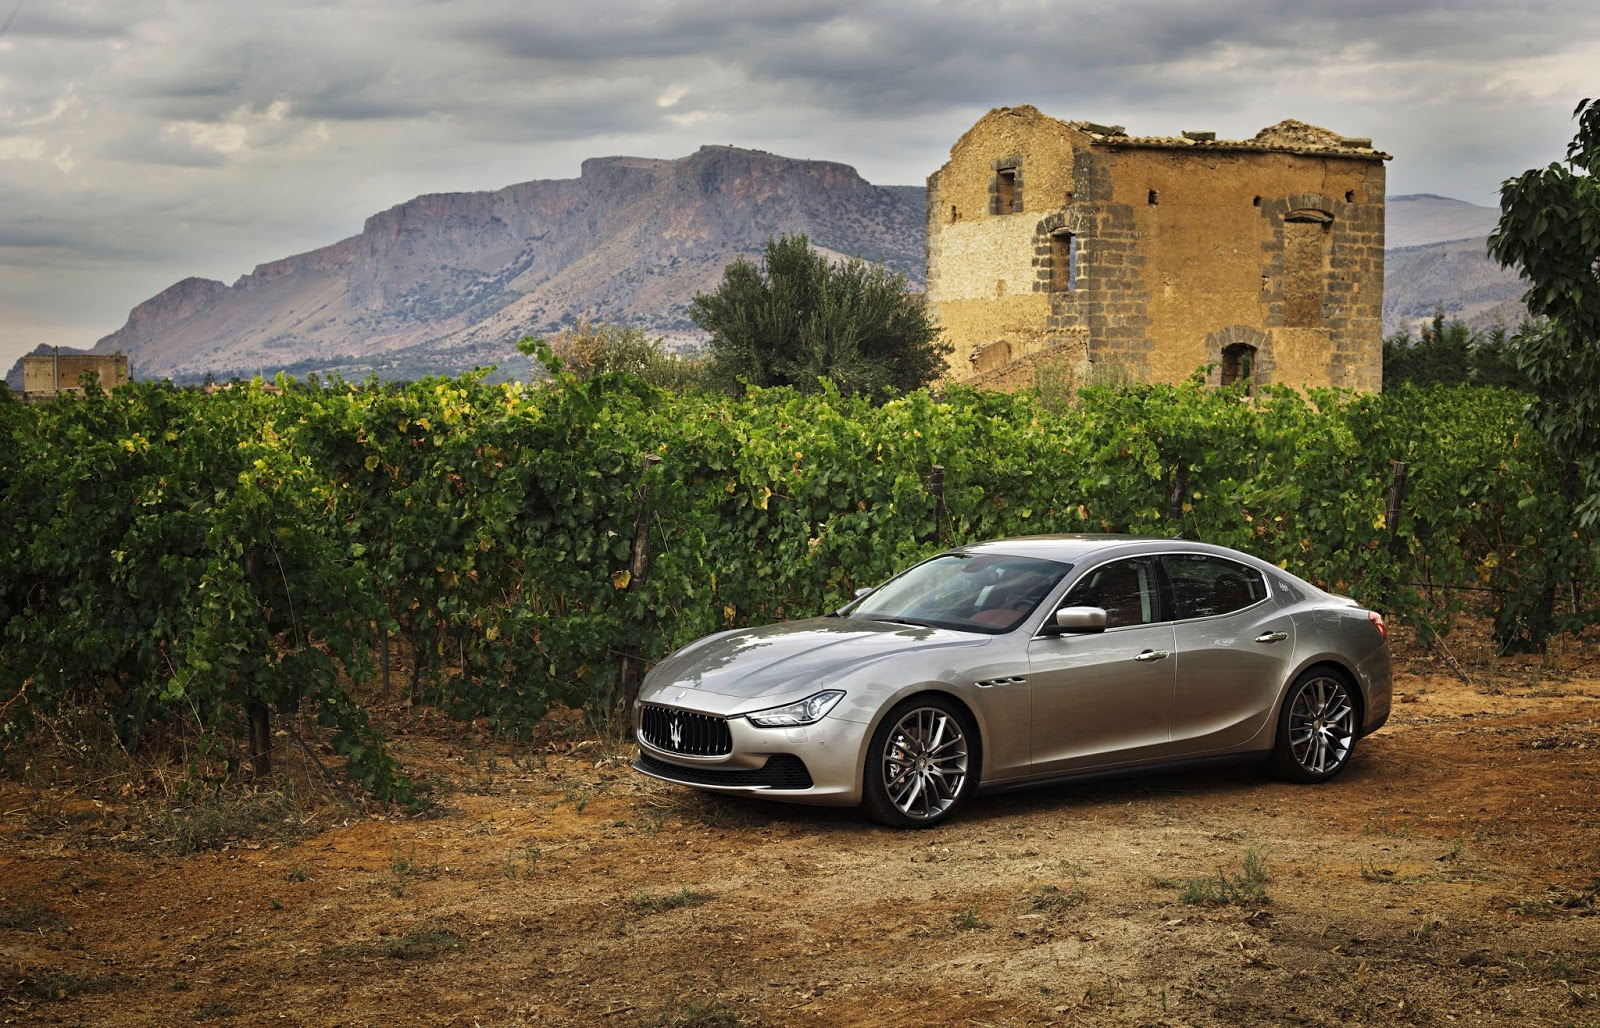 565c41b5ee742 Τα πάντα για το πρώτο SUV της Maserati autoshow, Maserati, Maserati Ghibli, Maserati Ghibli S, Maserati Ghibli S Q4, Maserati GranTurismo, Maserati Levante, Maserati Levante S, Maserati Quattroporte, zblog